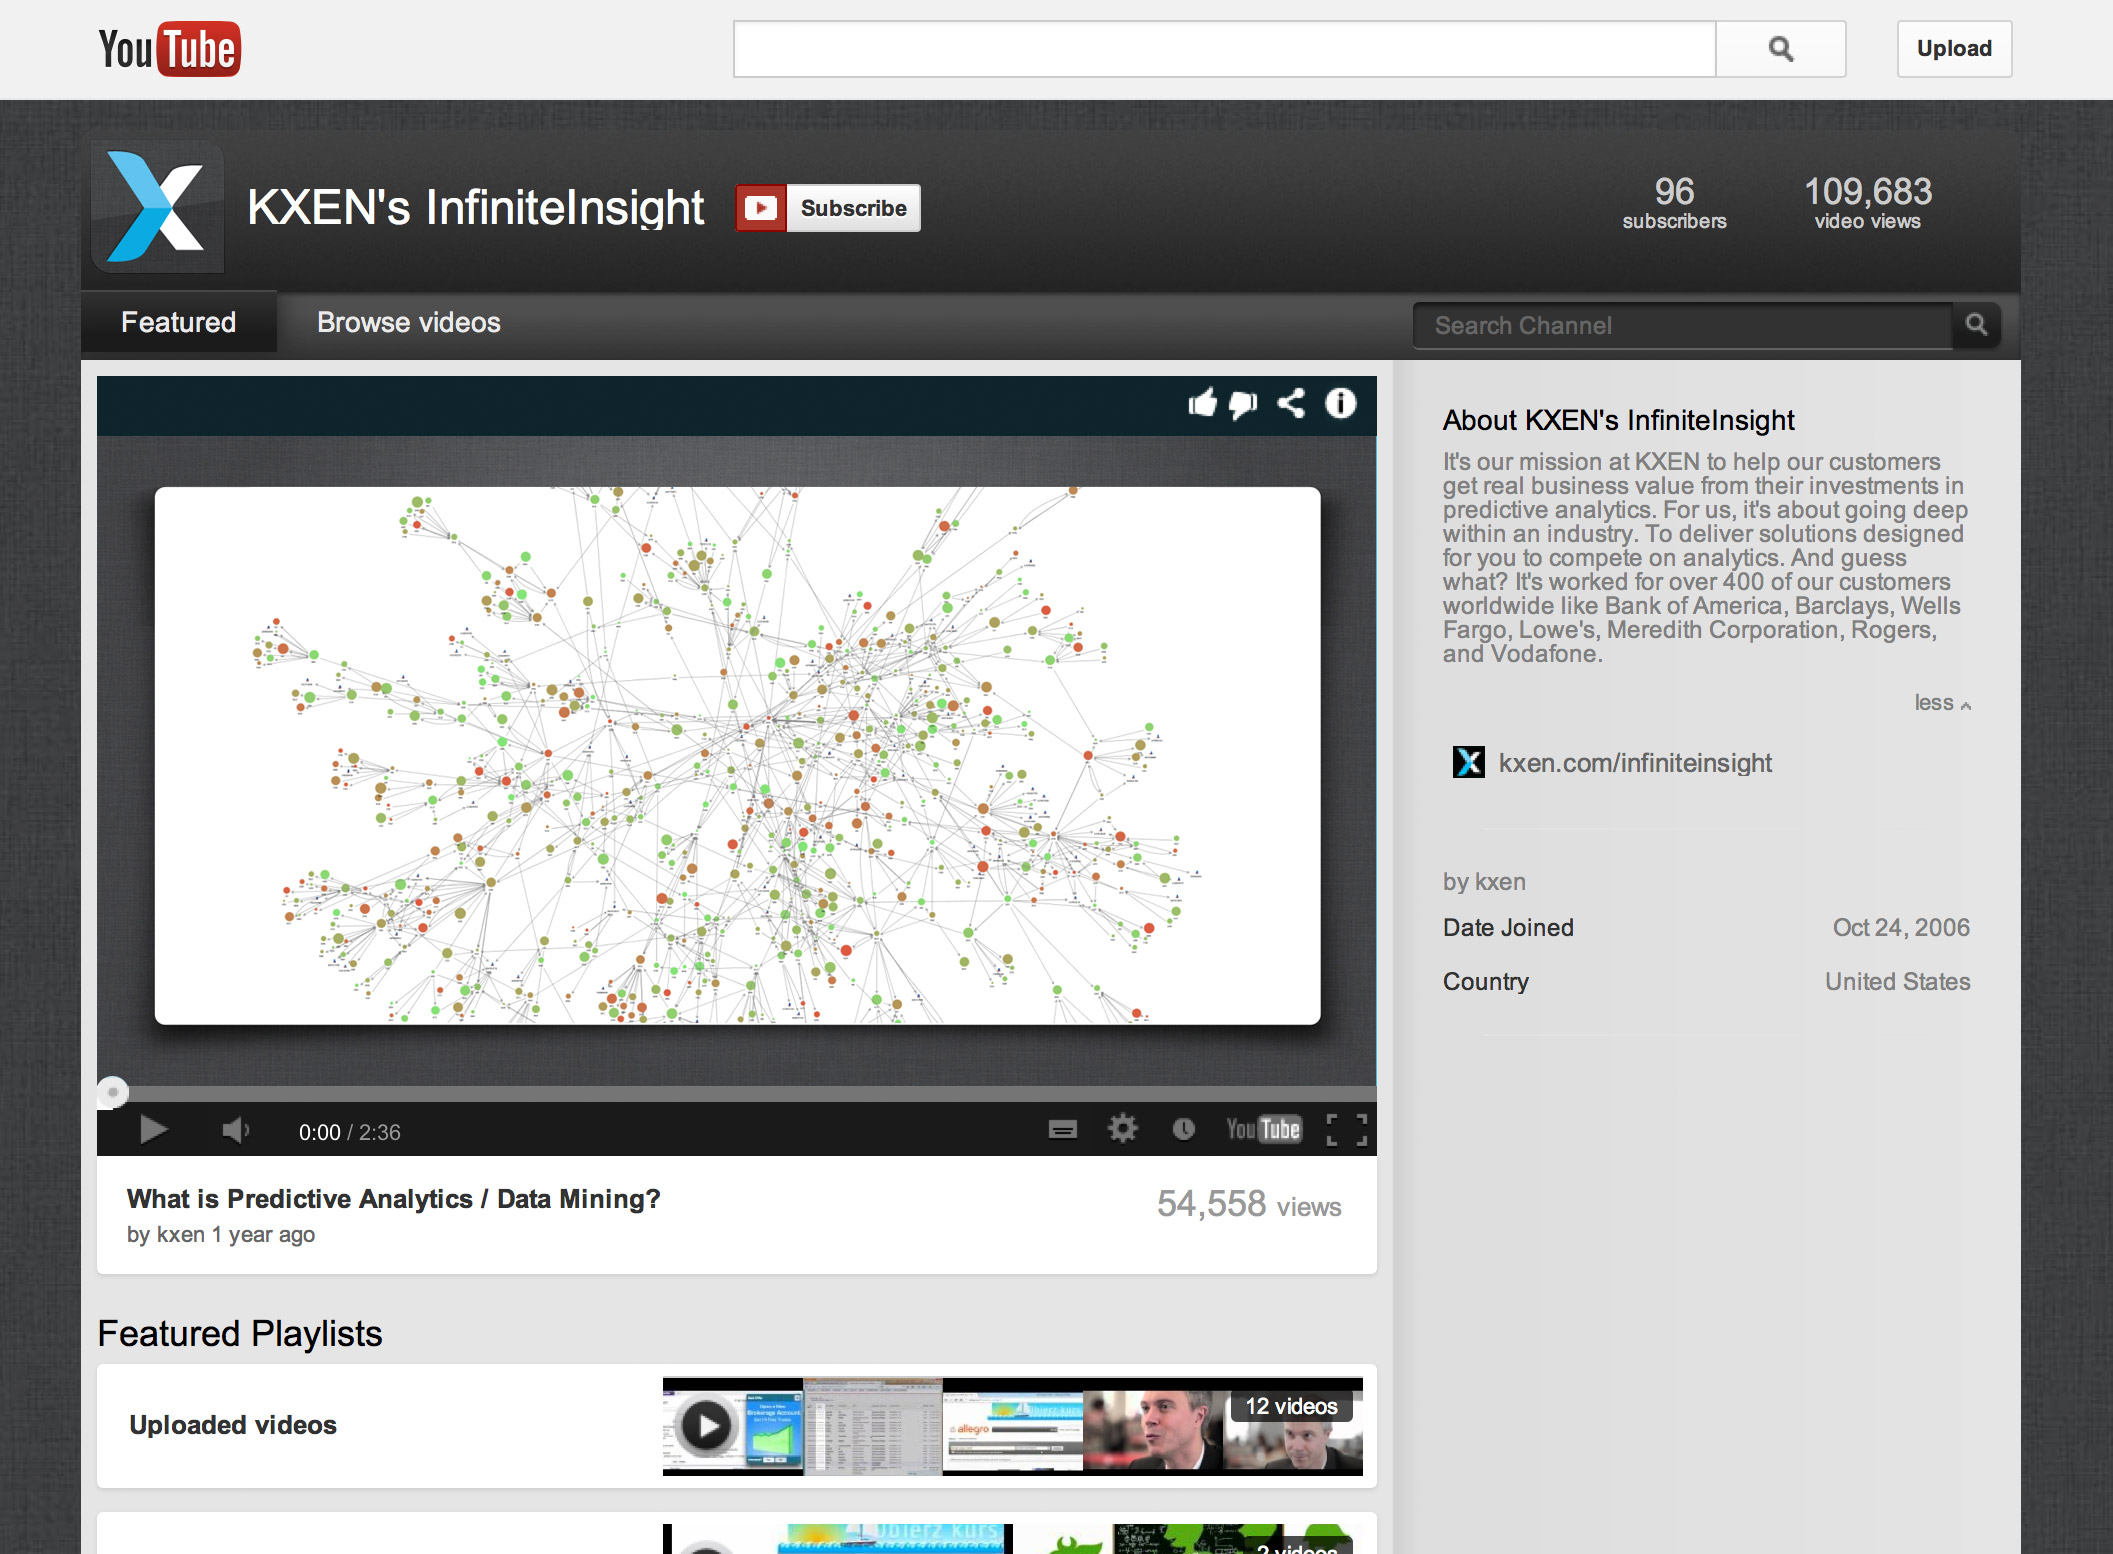 KXEN_YouTube.jpg